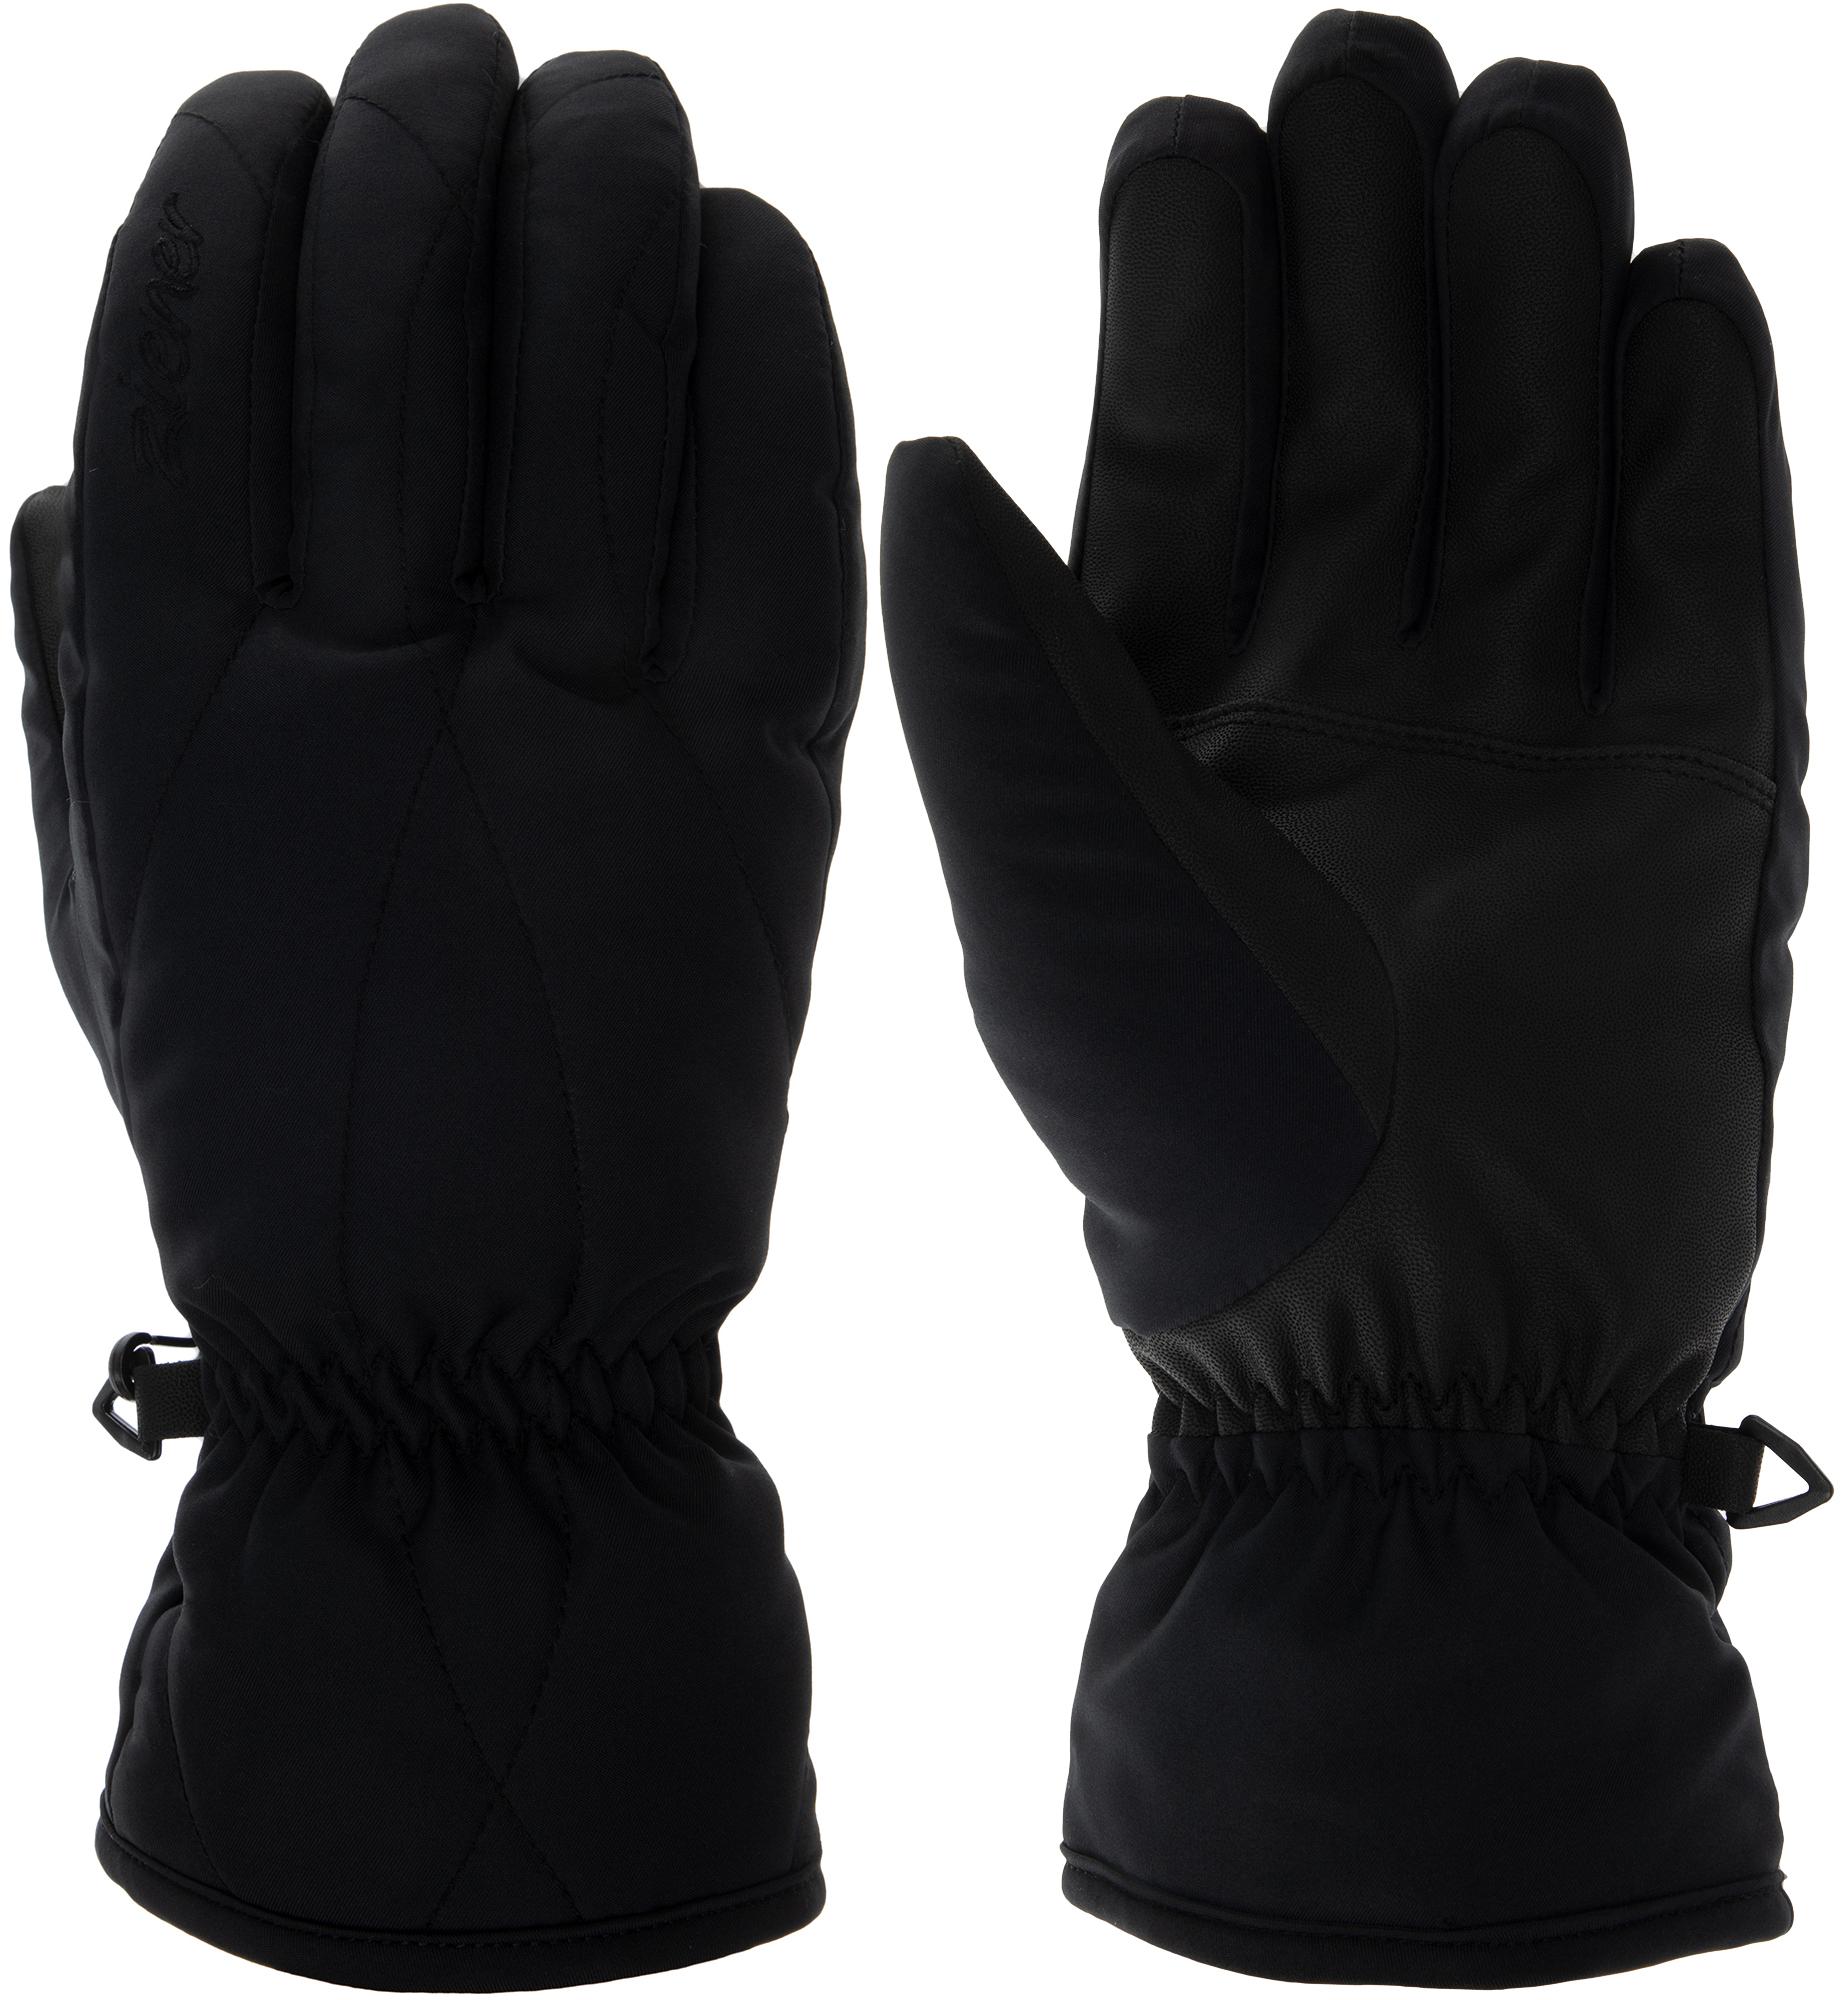 цена на Ziener Перчатки женские Ziener, размер 8